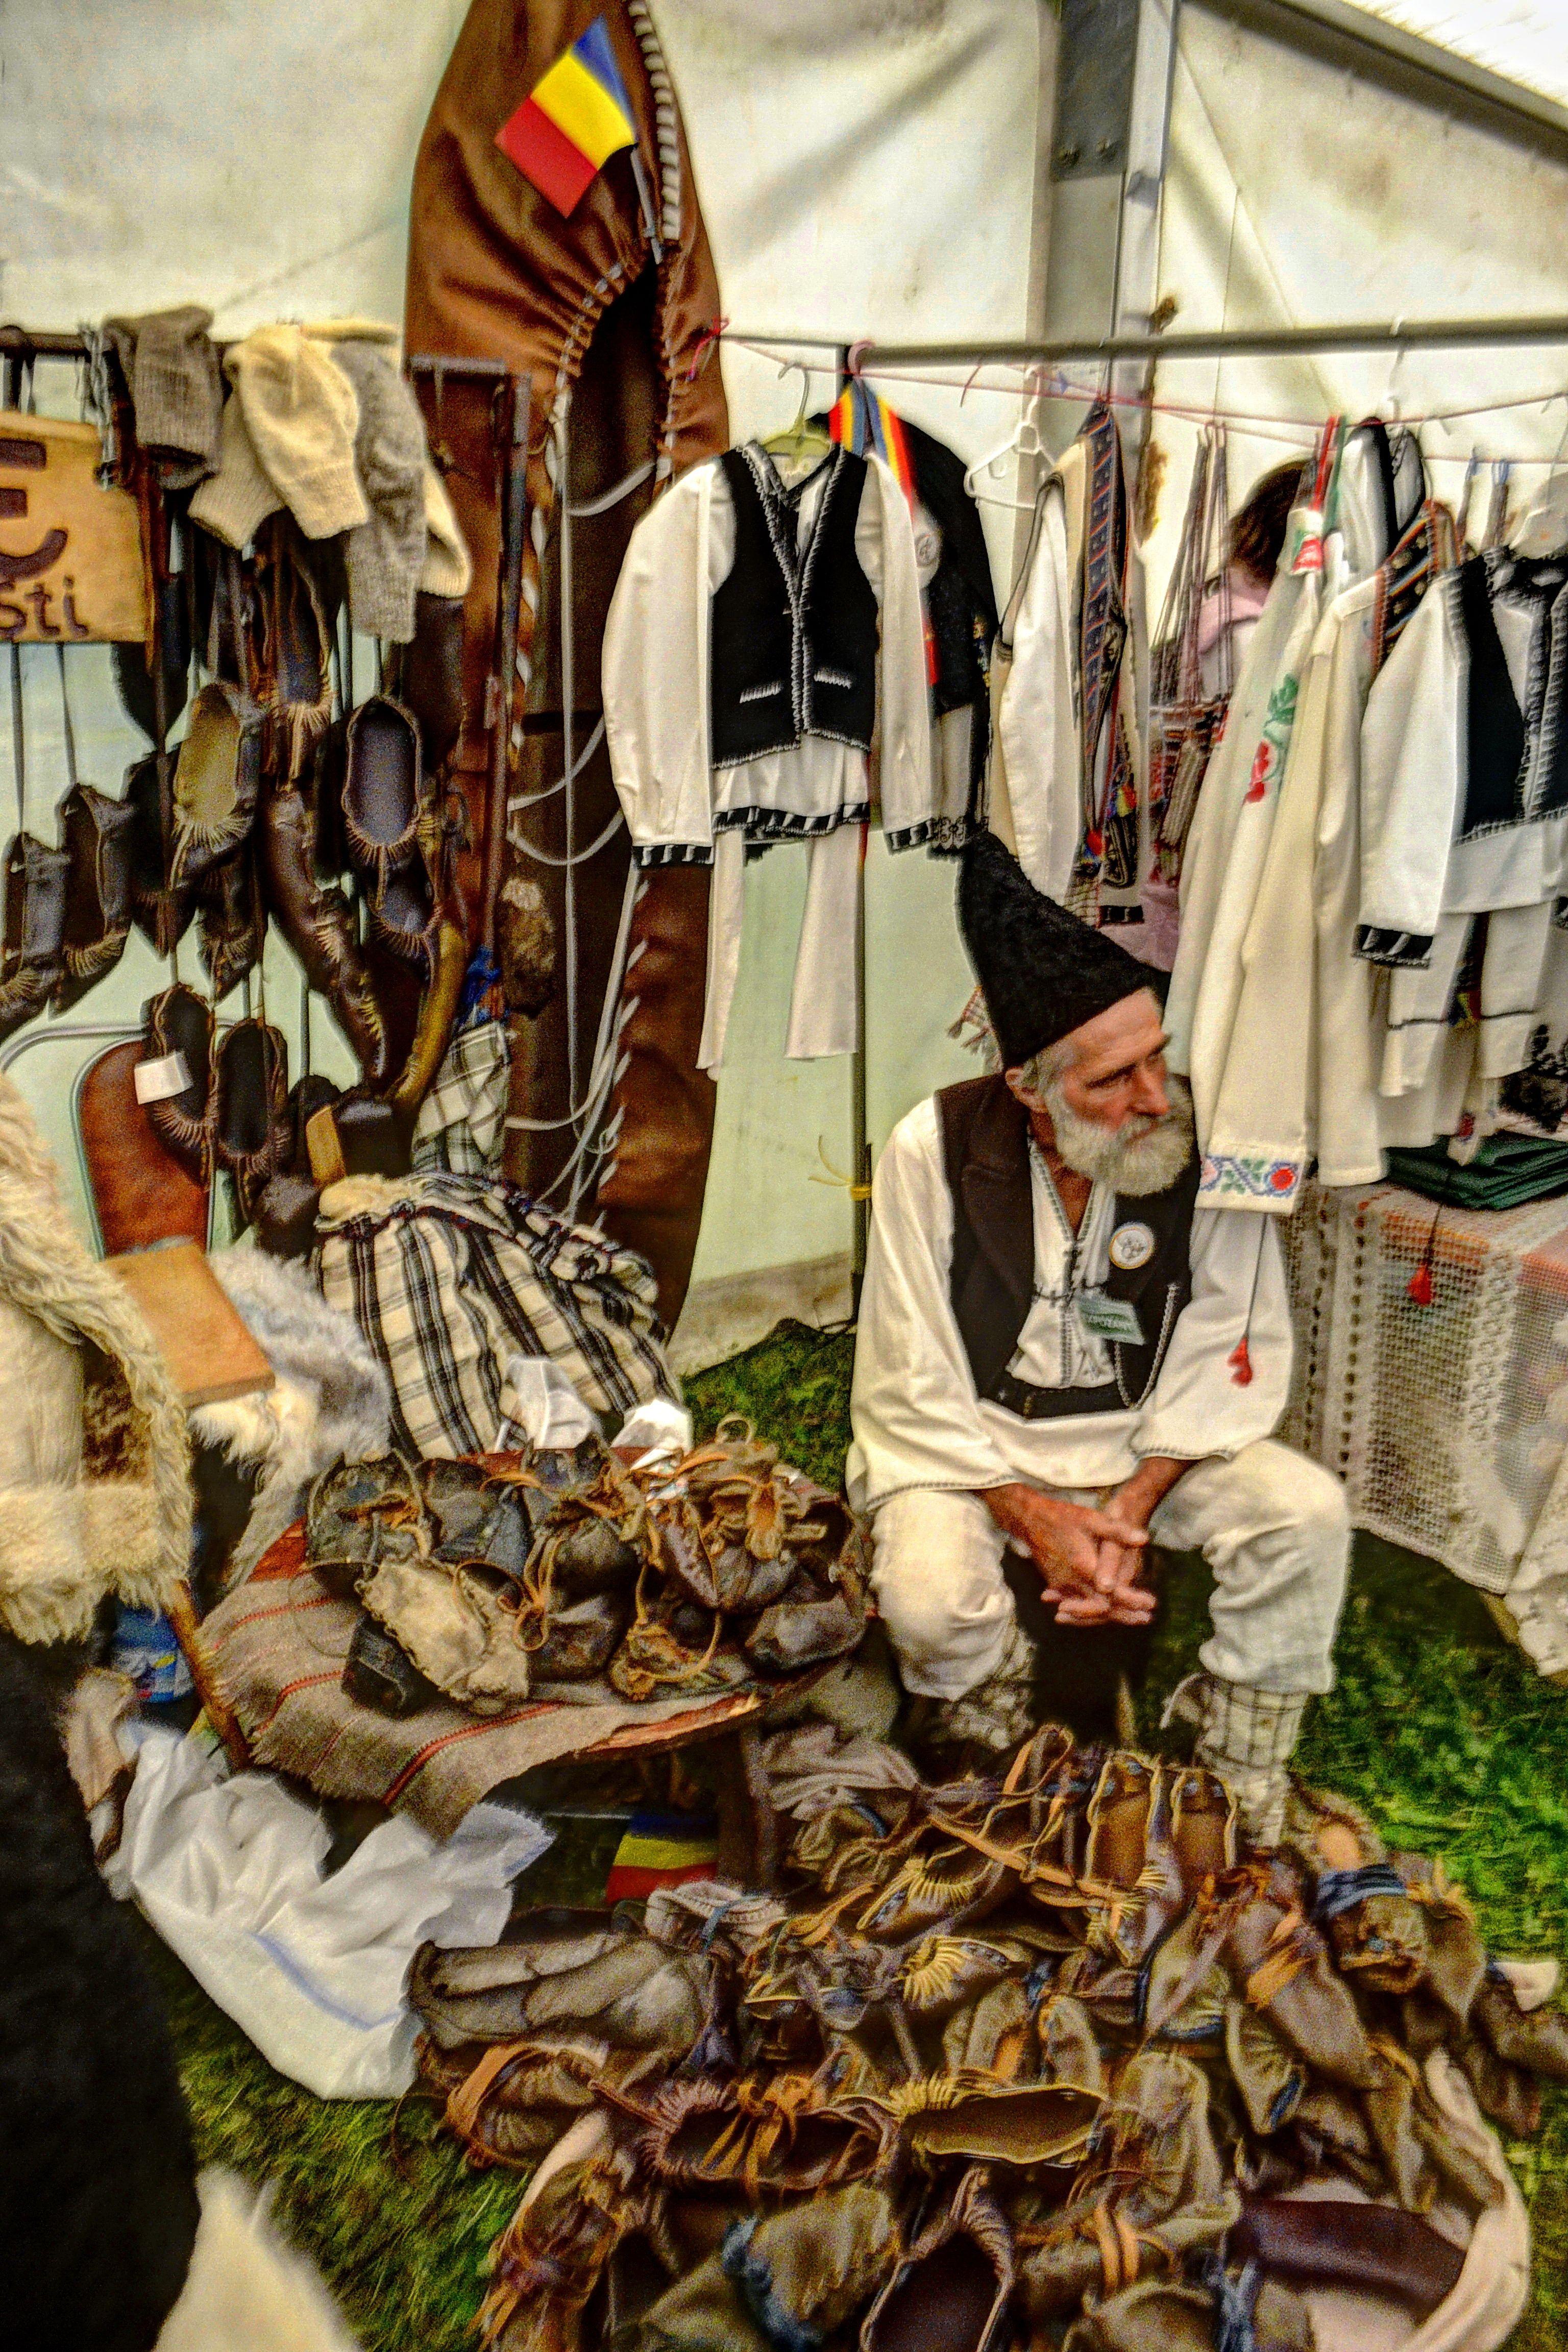 traditional leather shoe maker Romania www.romaniasfriends.com